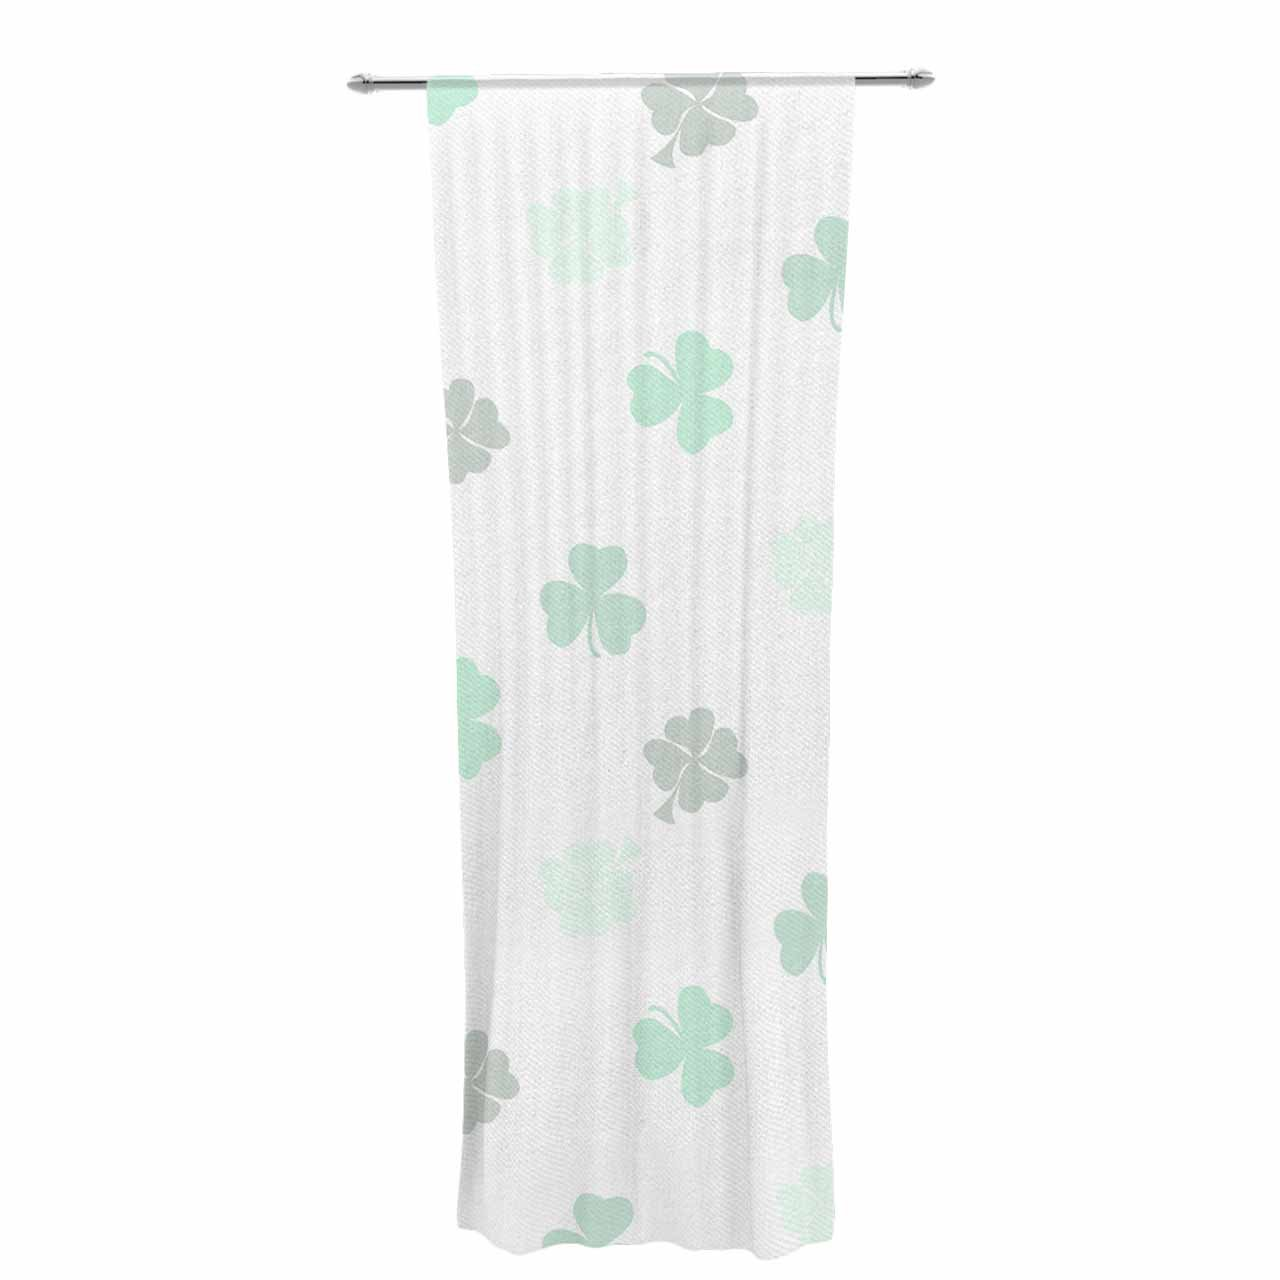 30 x 84 Sheer Curtains Kess InHouse NL Designs Lucky Shamrocks Green Typography Decorative Set